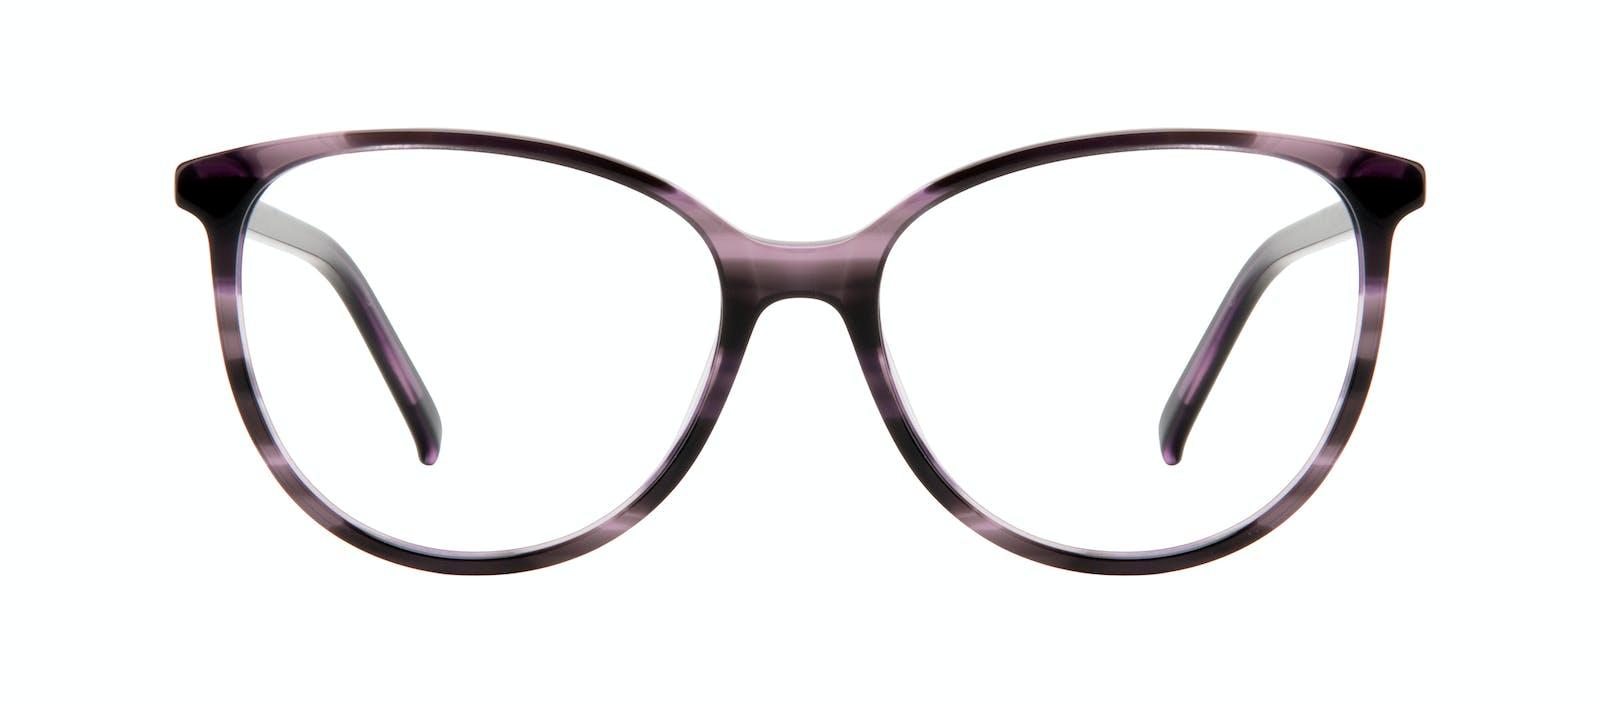 6b4990d822 Affordable Fashion Glasses Cat Eye Round Eyeglasses Women Imagine Leopard  Front